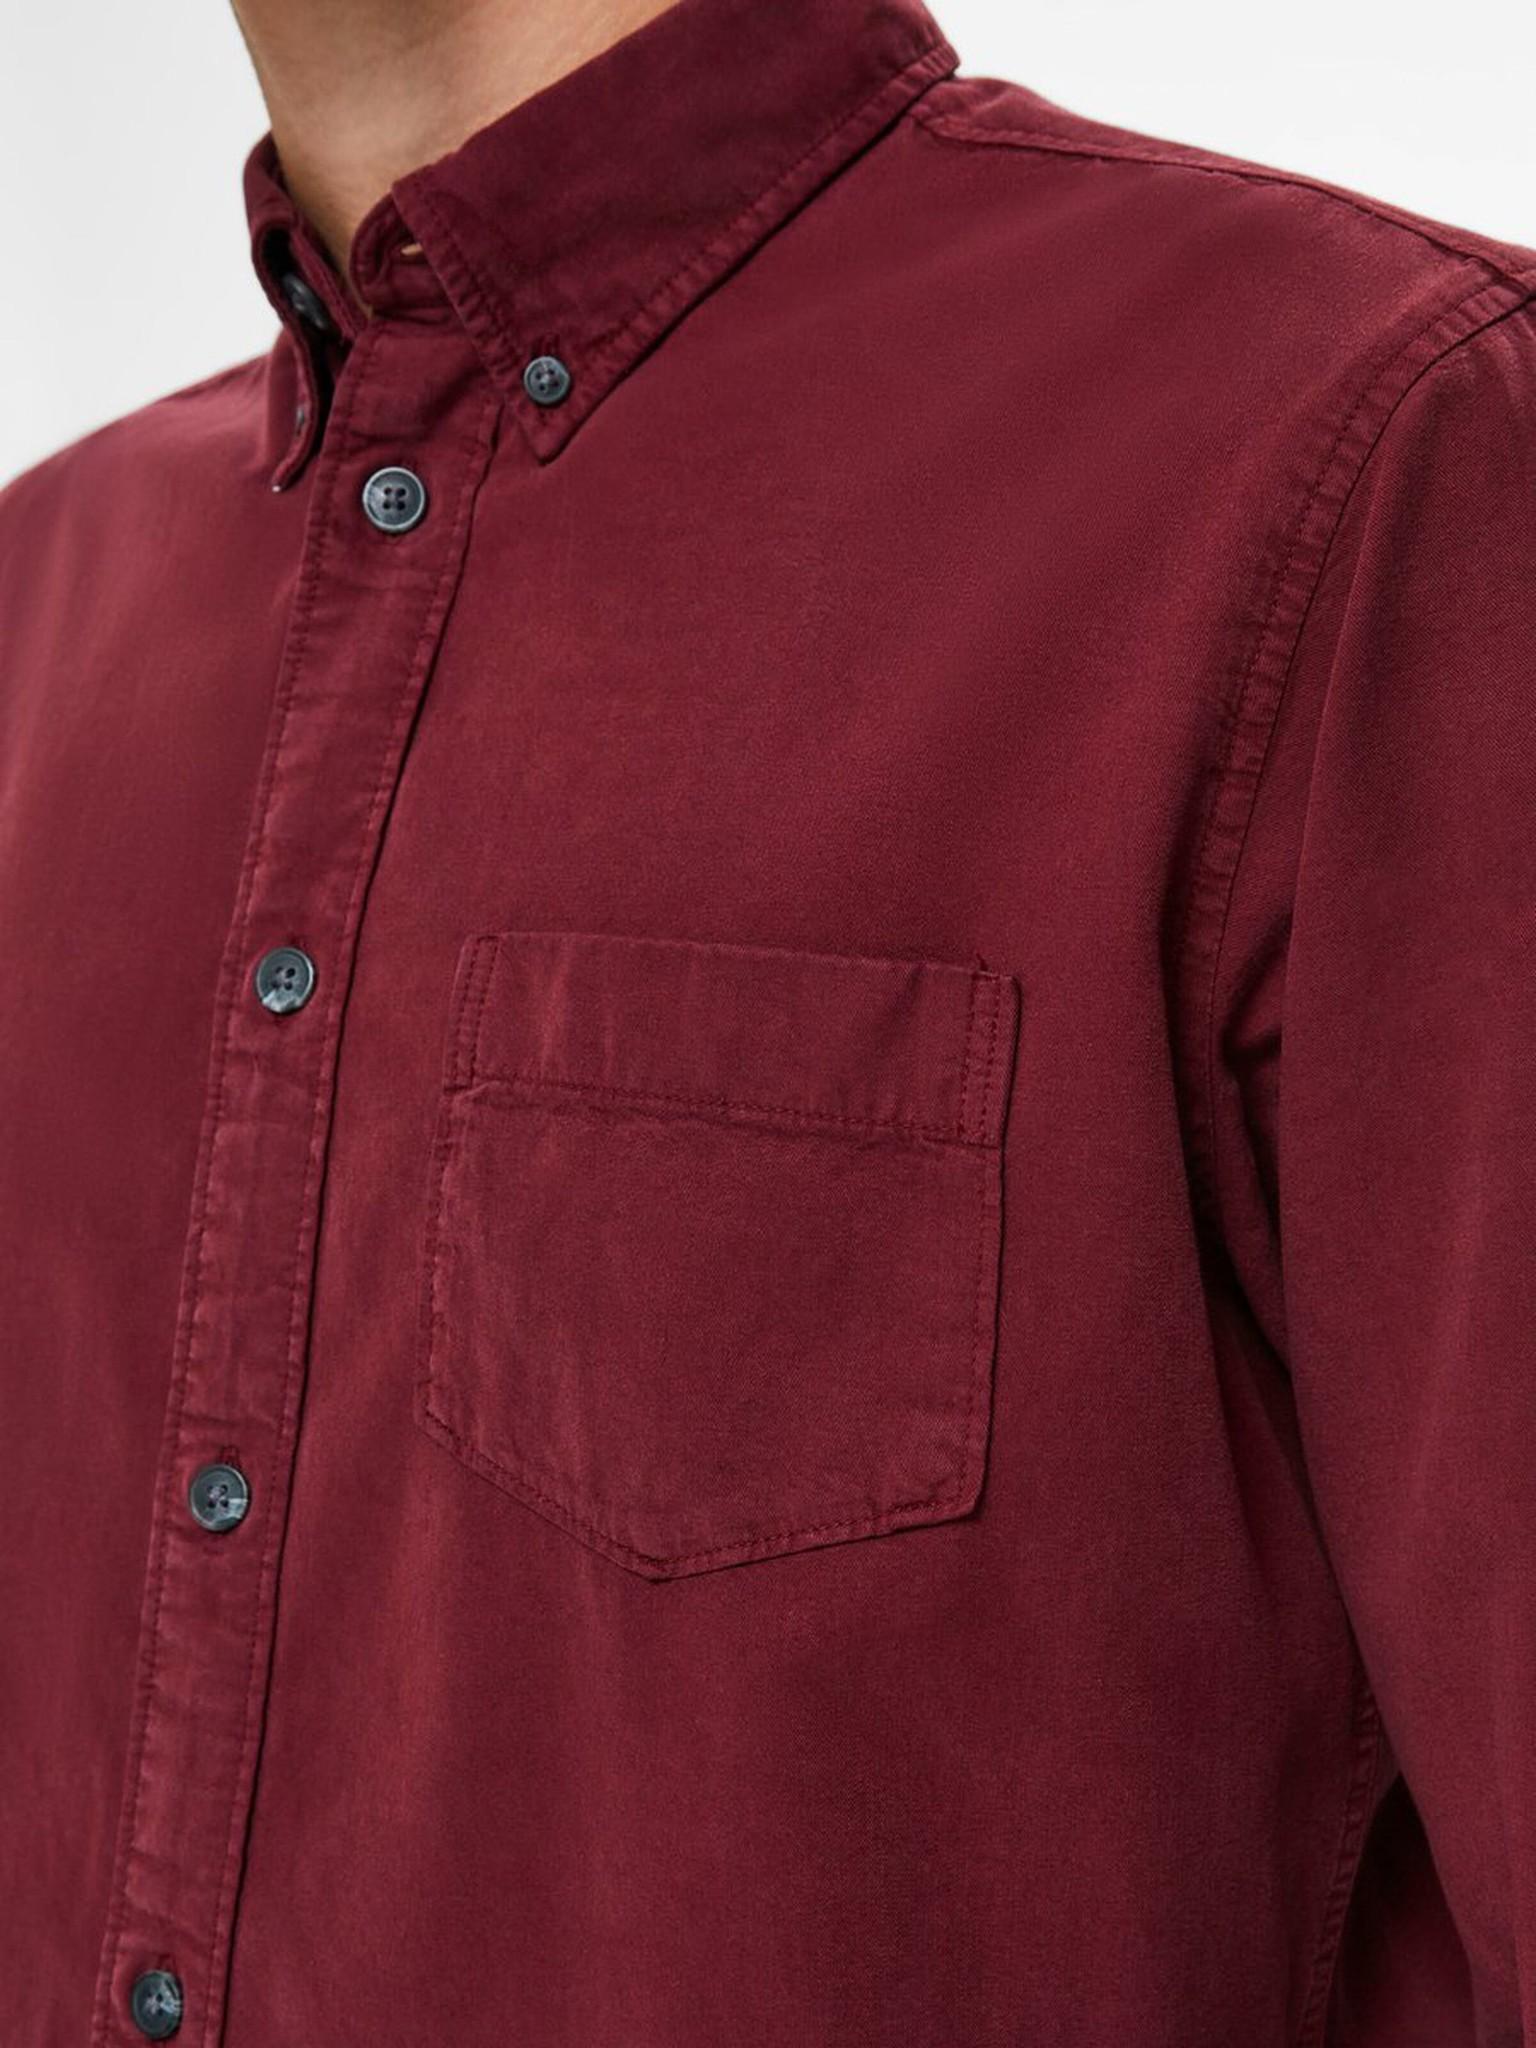 SELECTED chemise boutonnée-6